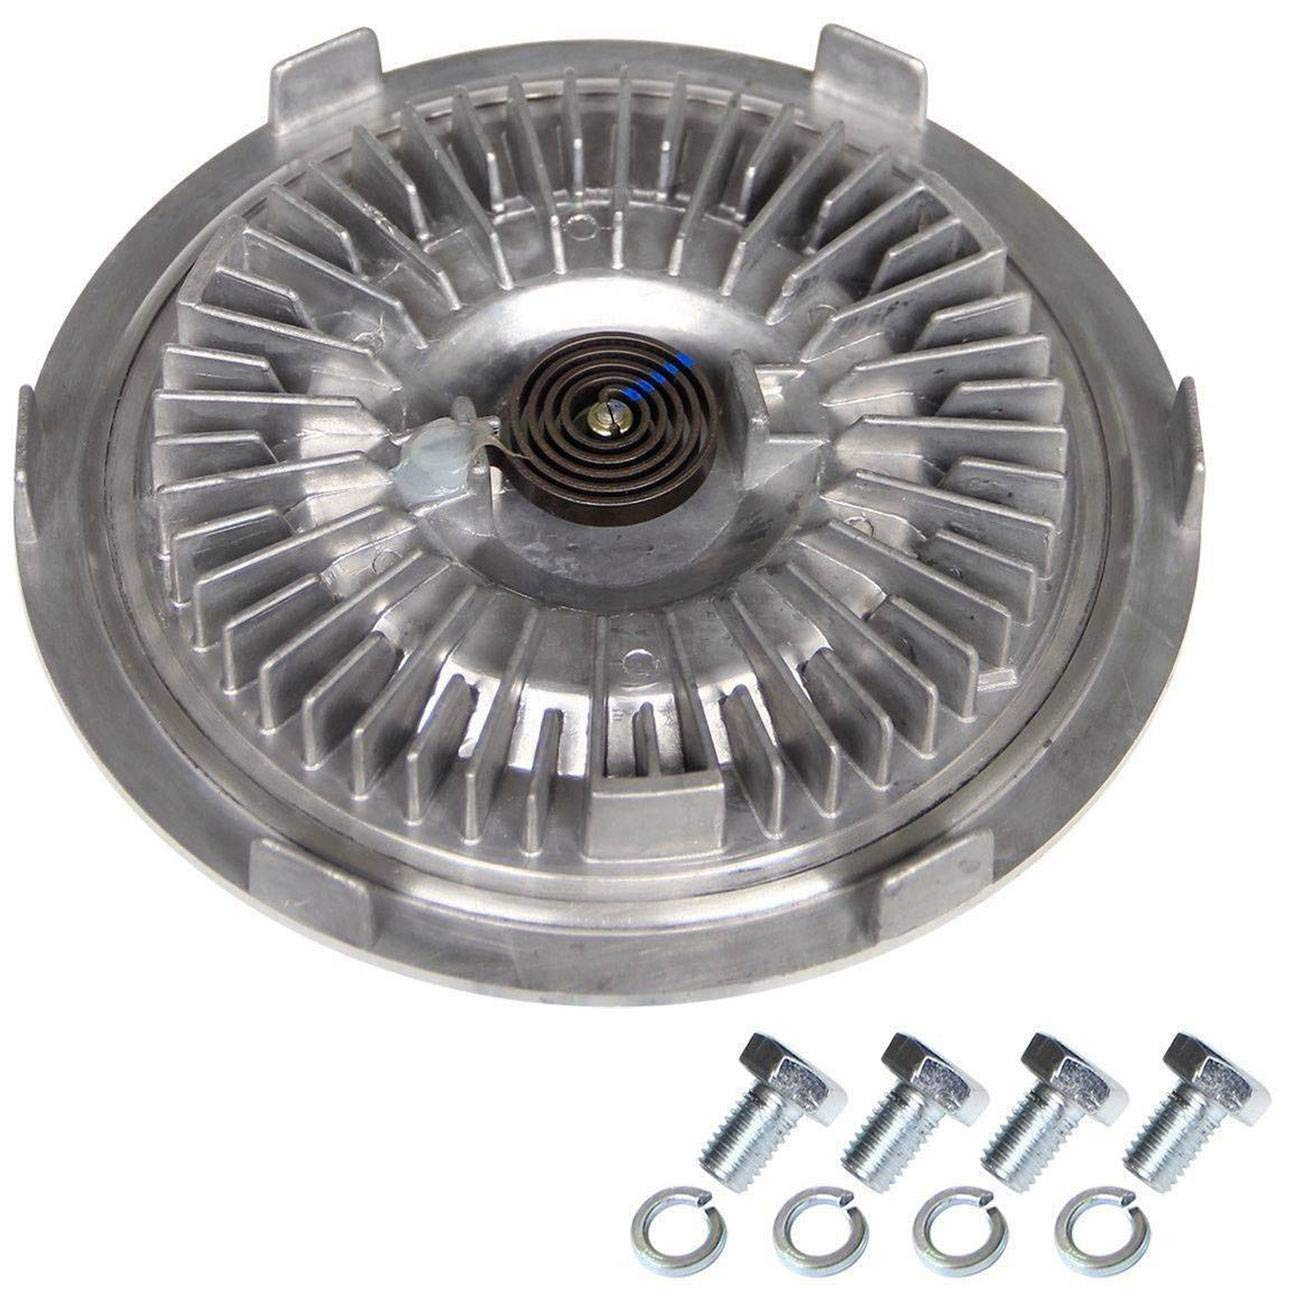 TOPAZ 2635 Engine Cooling Fan Clutch for Jeep Dodge Nitro Liberty Commander Grand Cherokee 3.7L 4.0L 4.7L